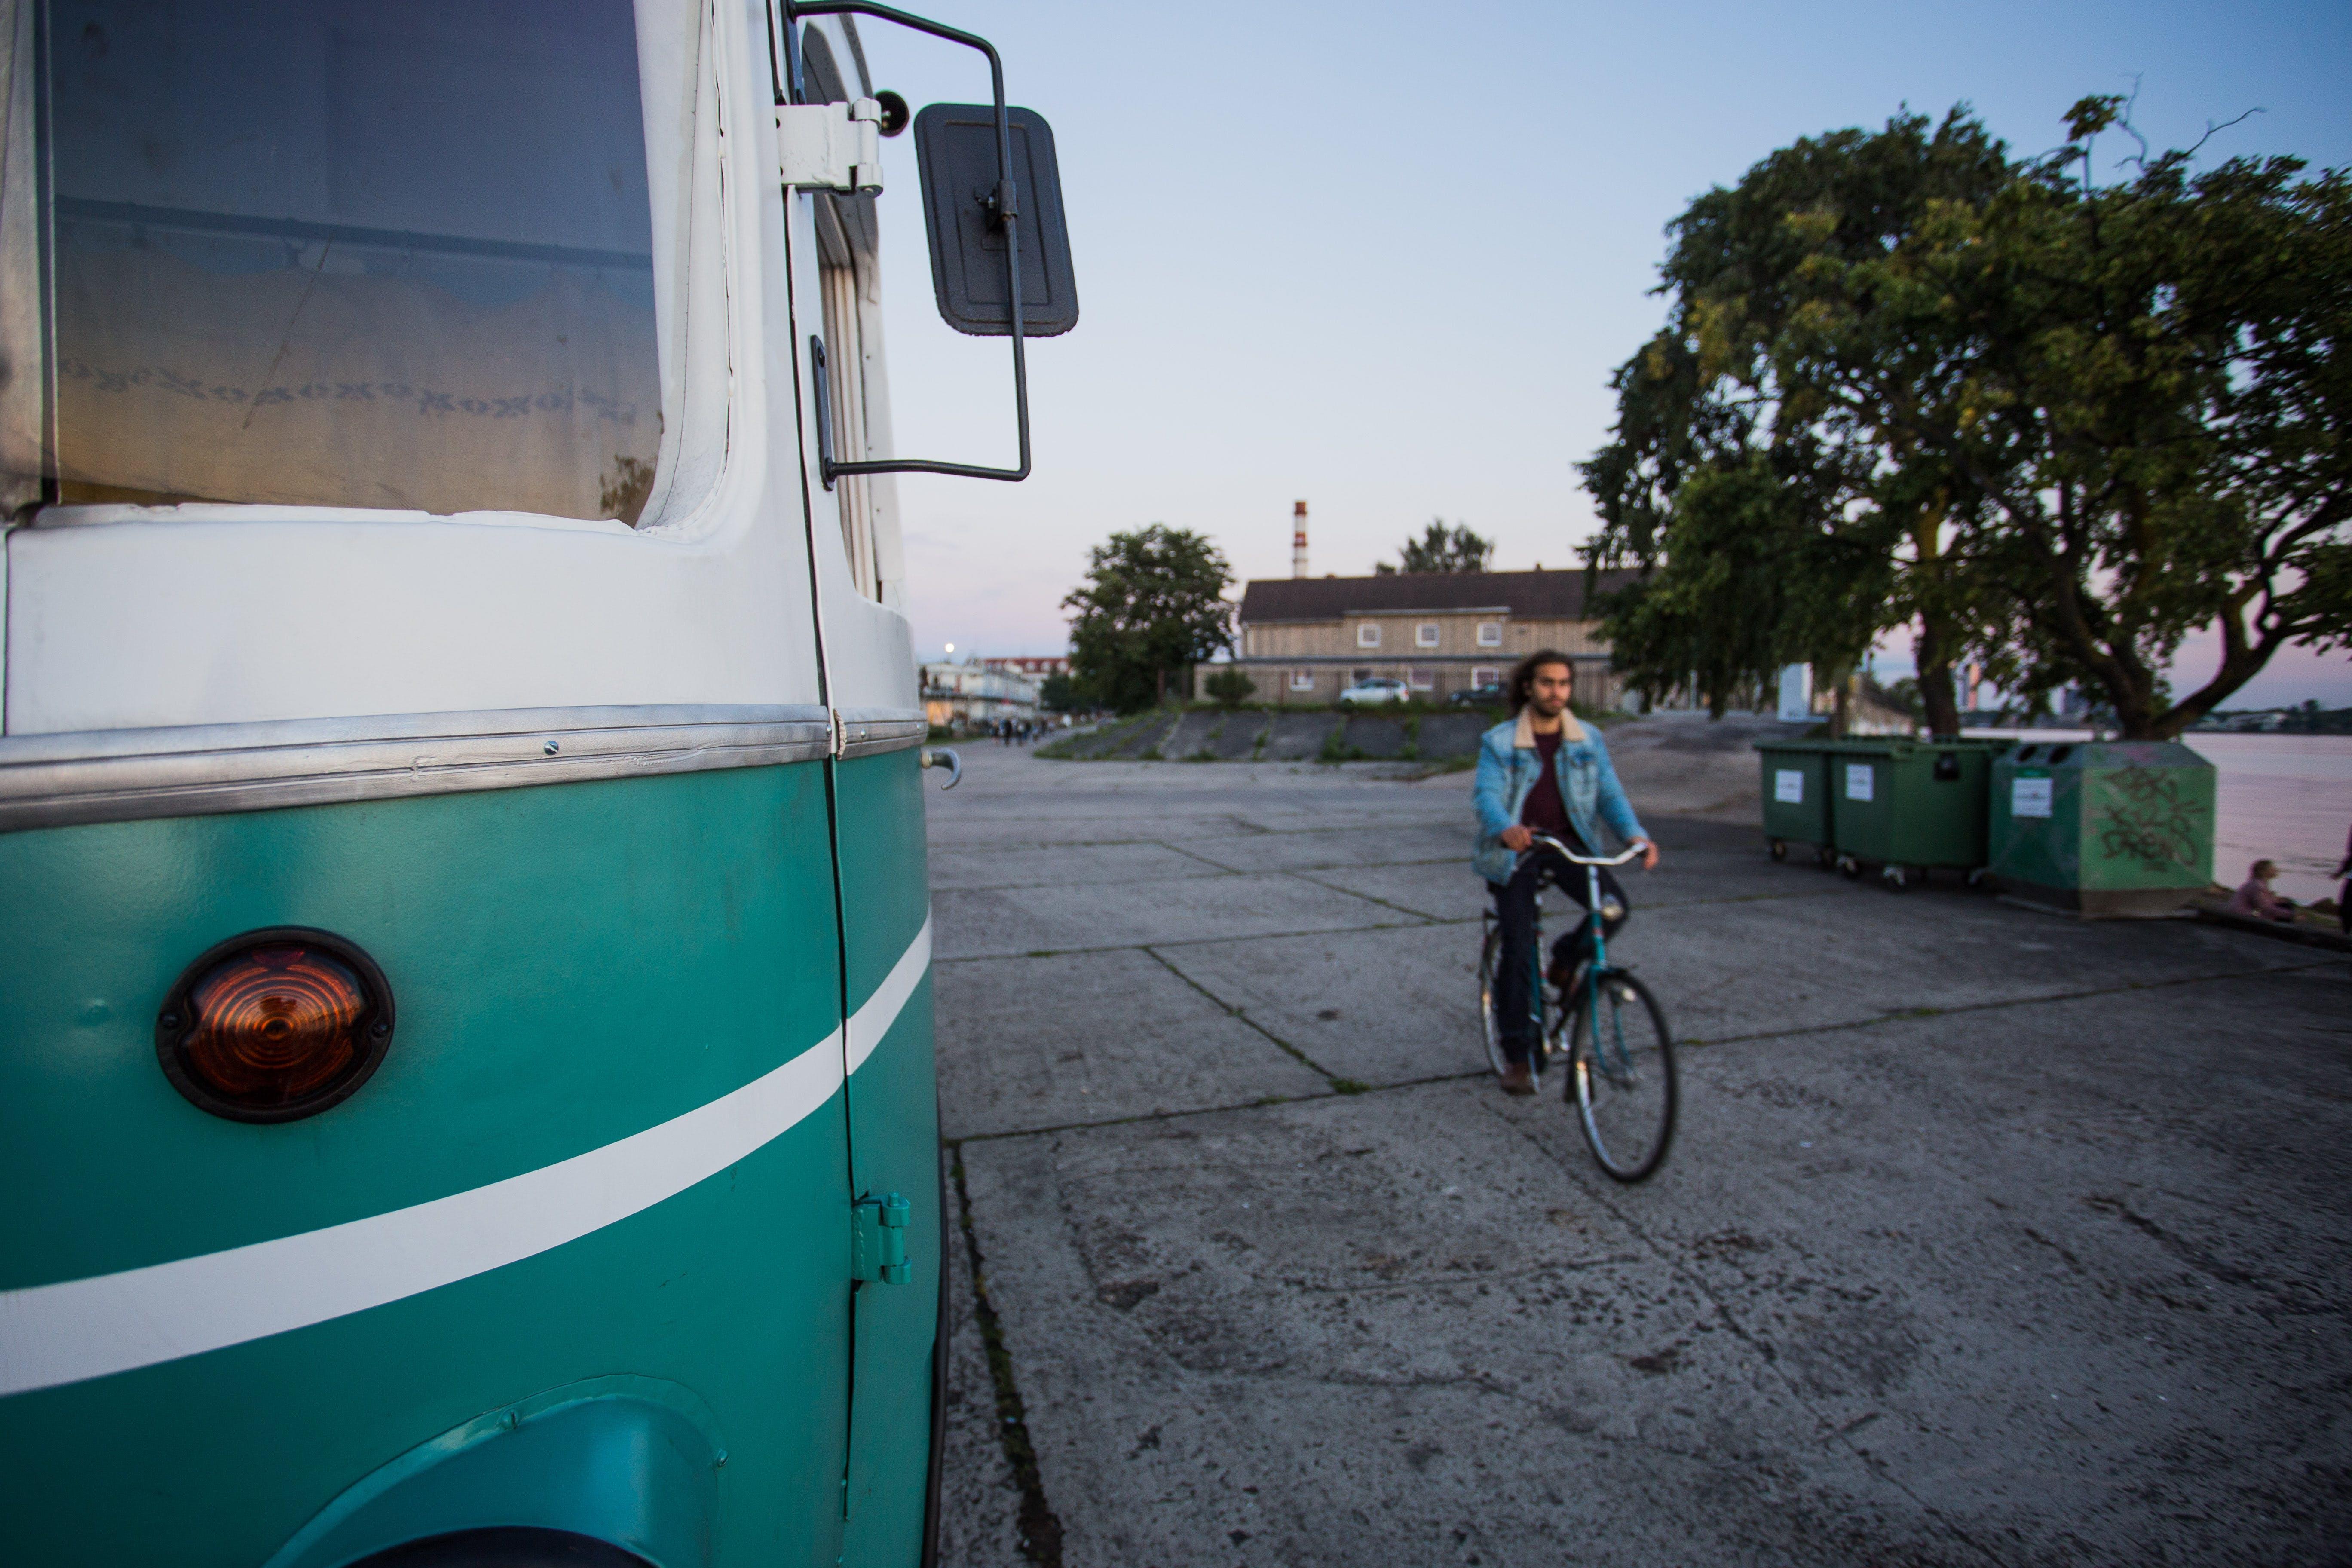 Kostnadsfri bild av asfalt, bil, dagsljus, gata